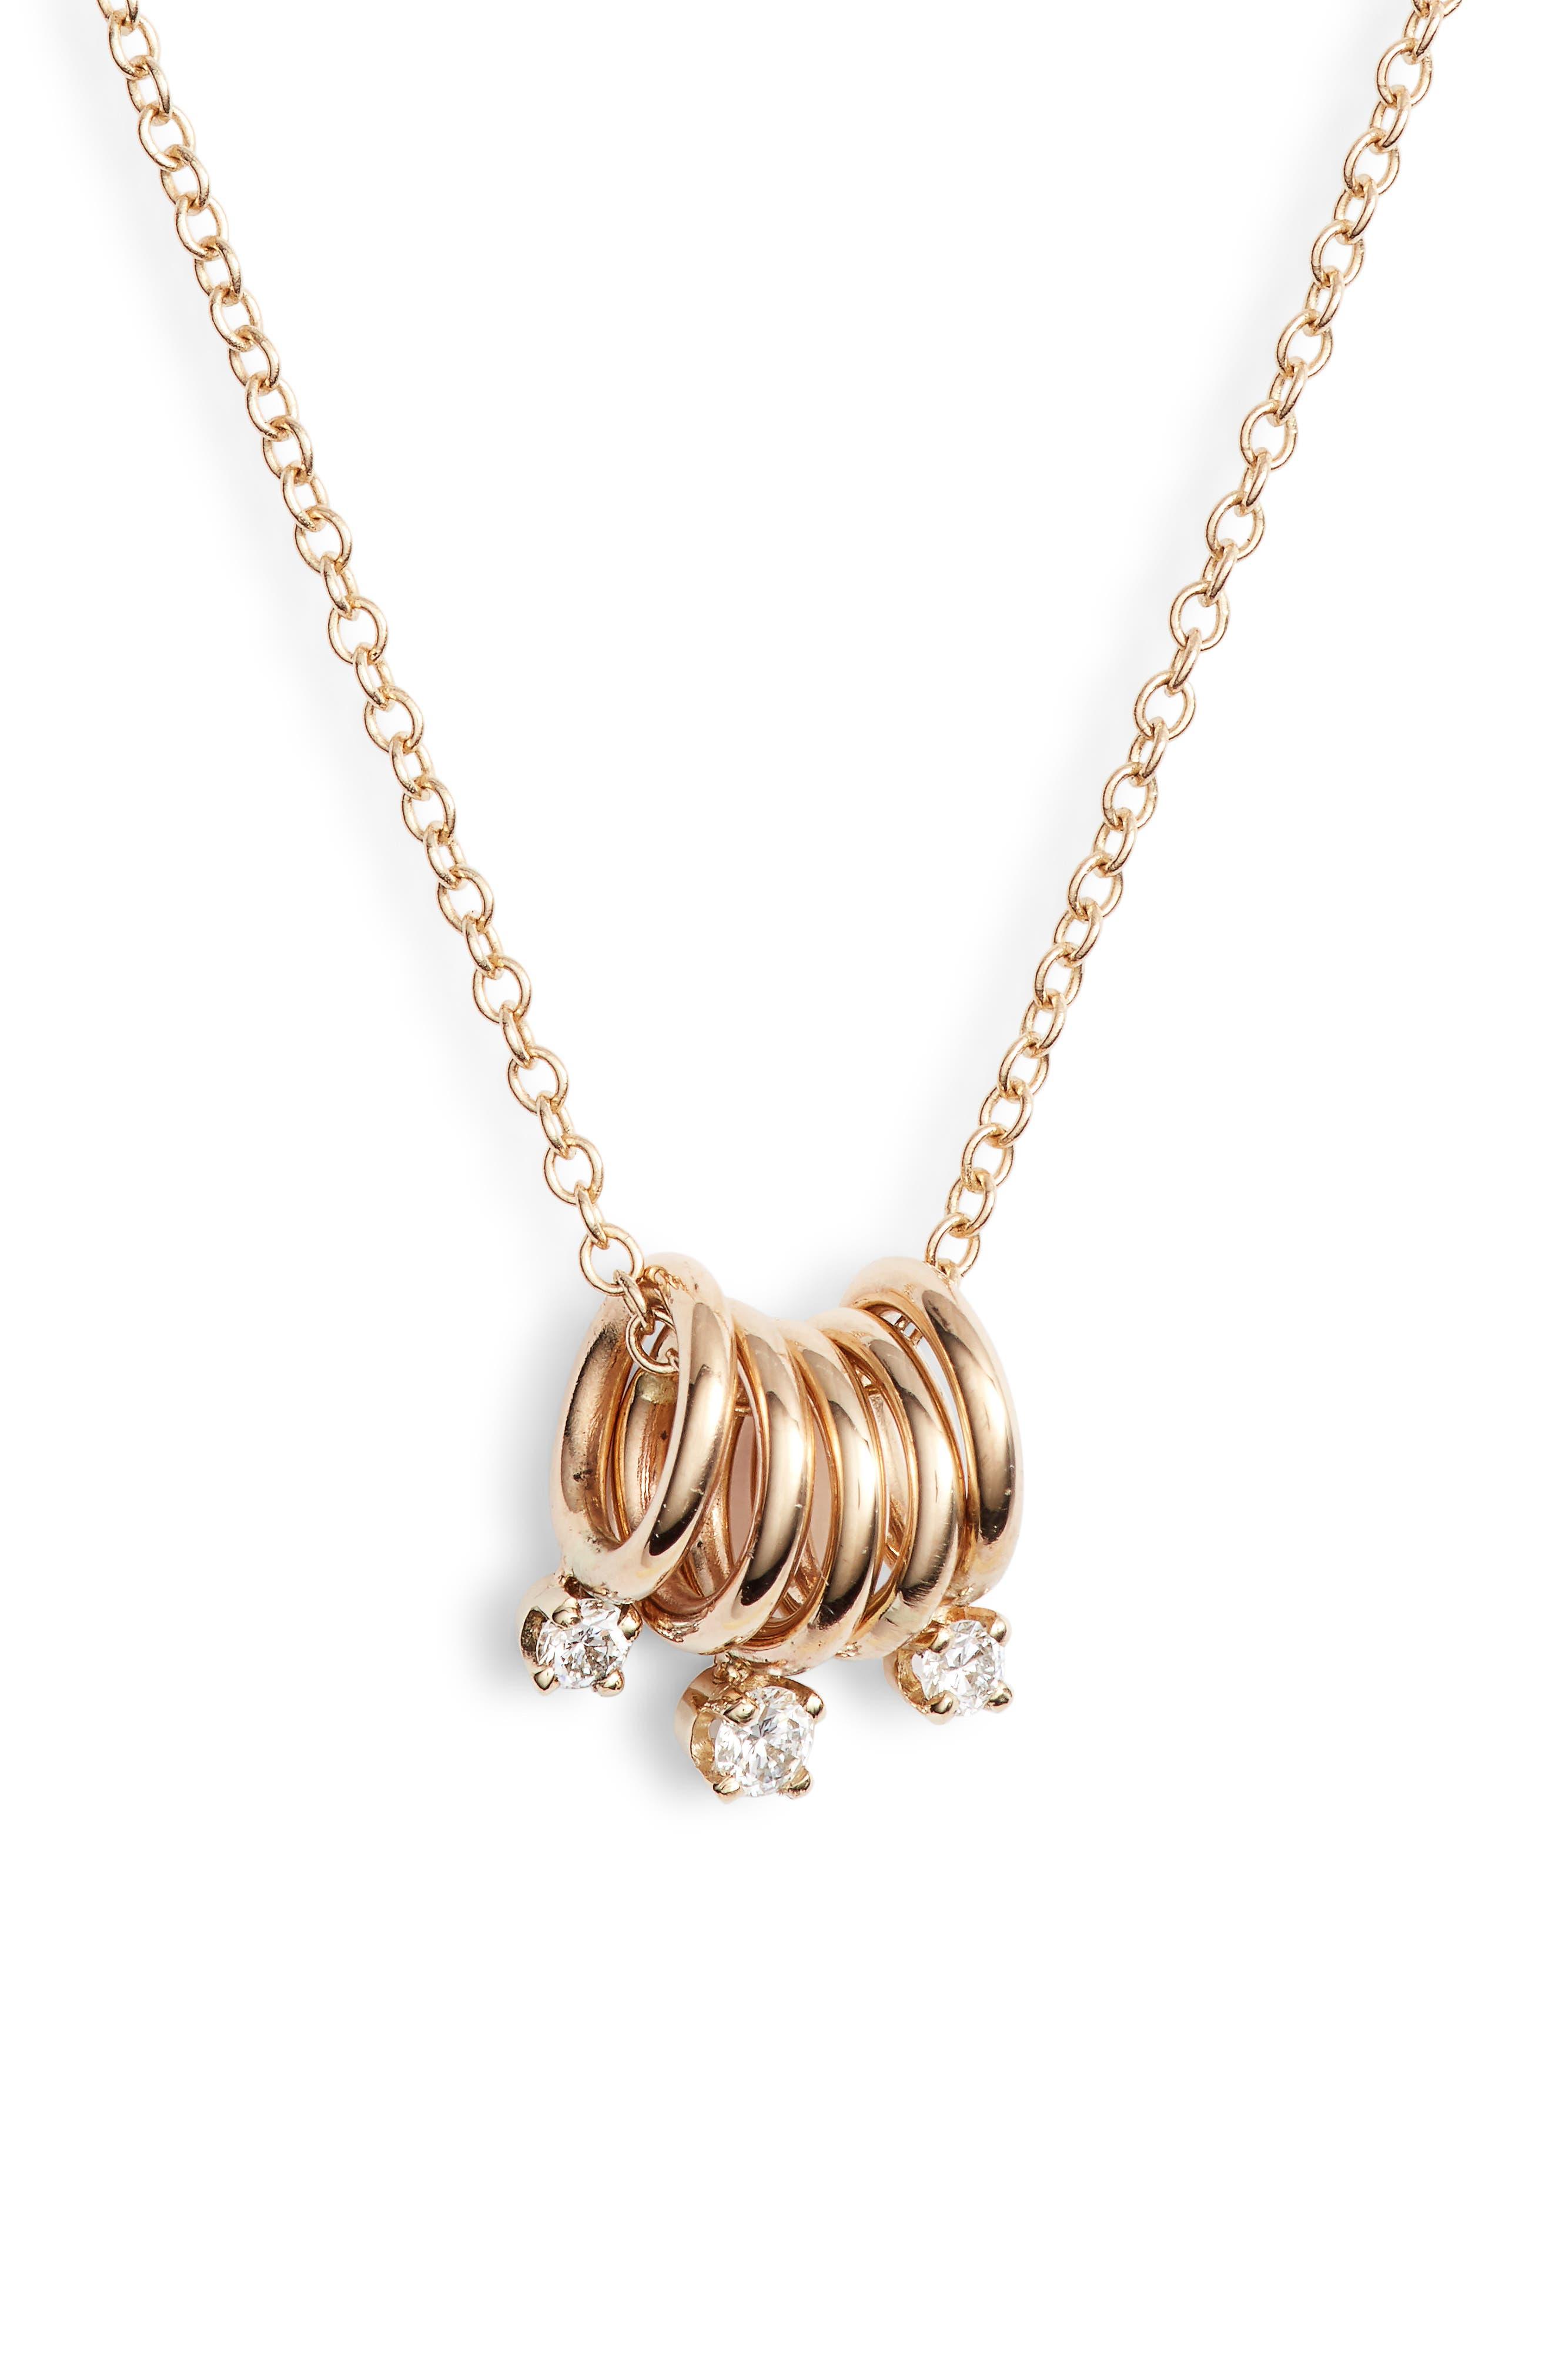 Zoe Chicco Diamond Rings Pendant Necklace